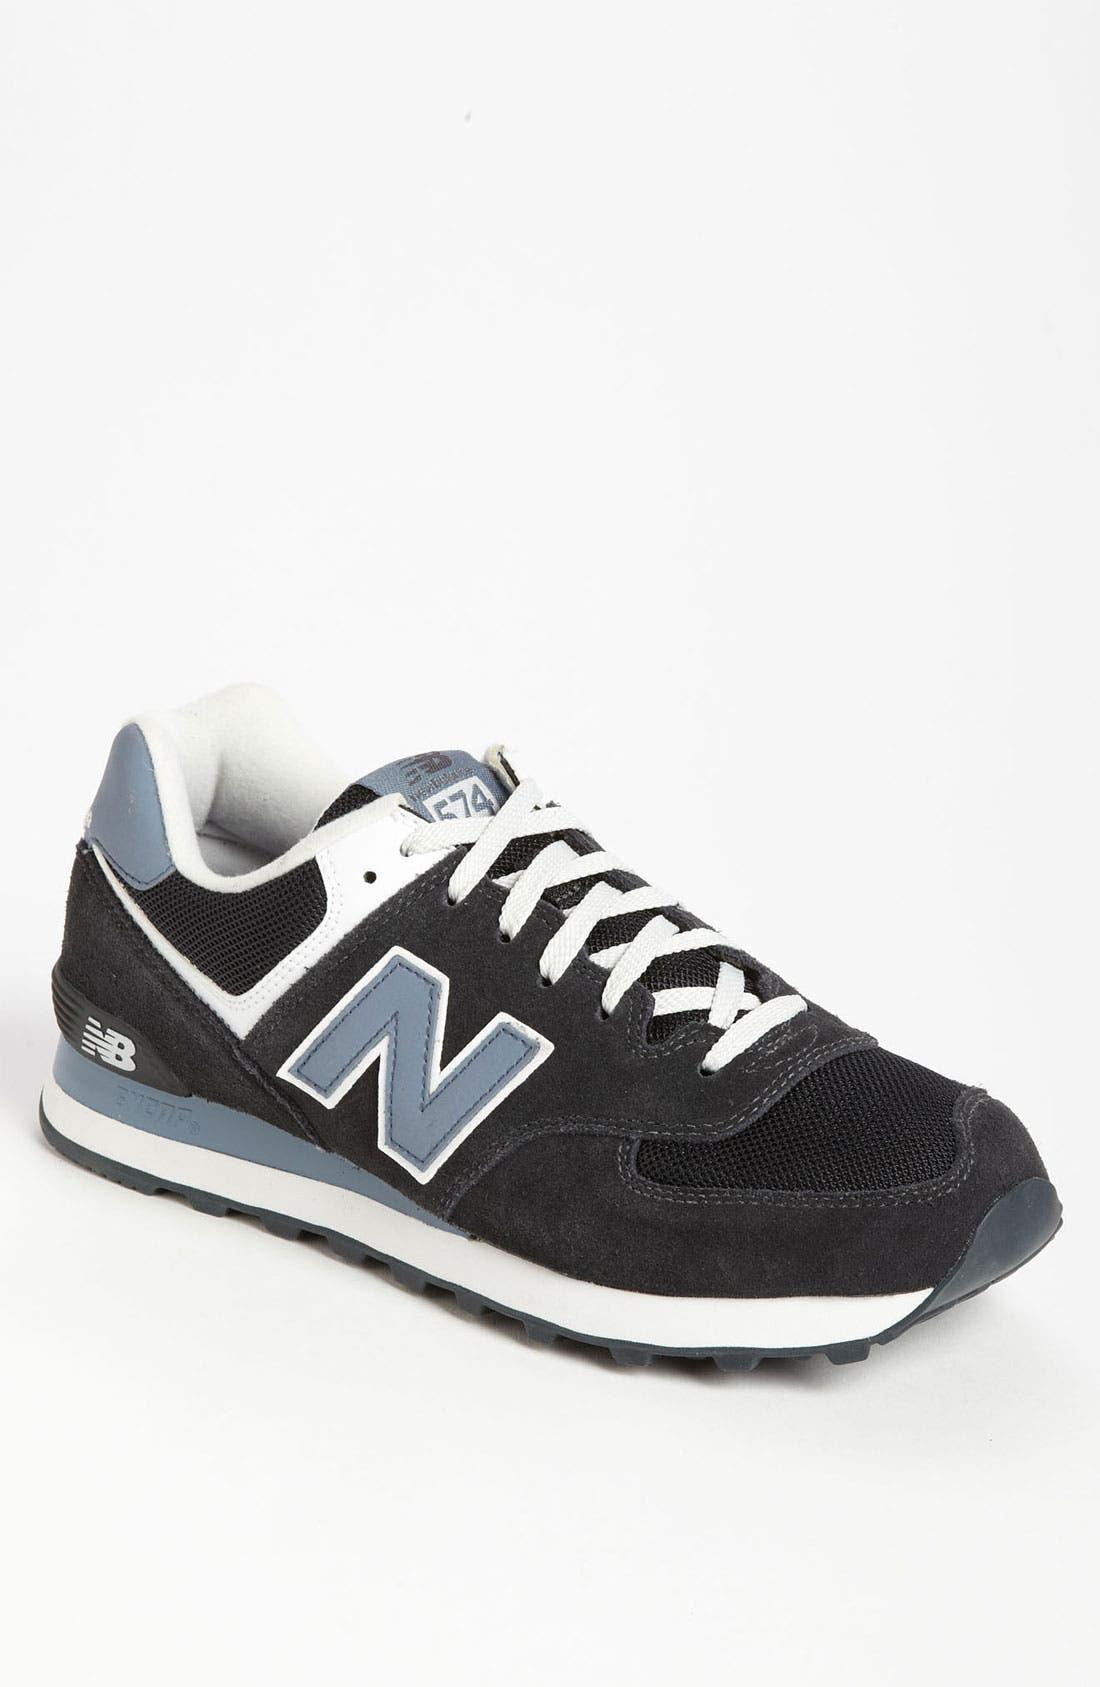 Alternate Image 1 Selected - New Balance '574' Sneaker (Men)